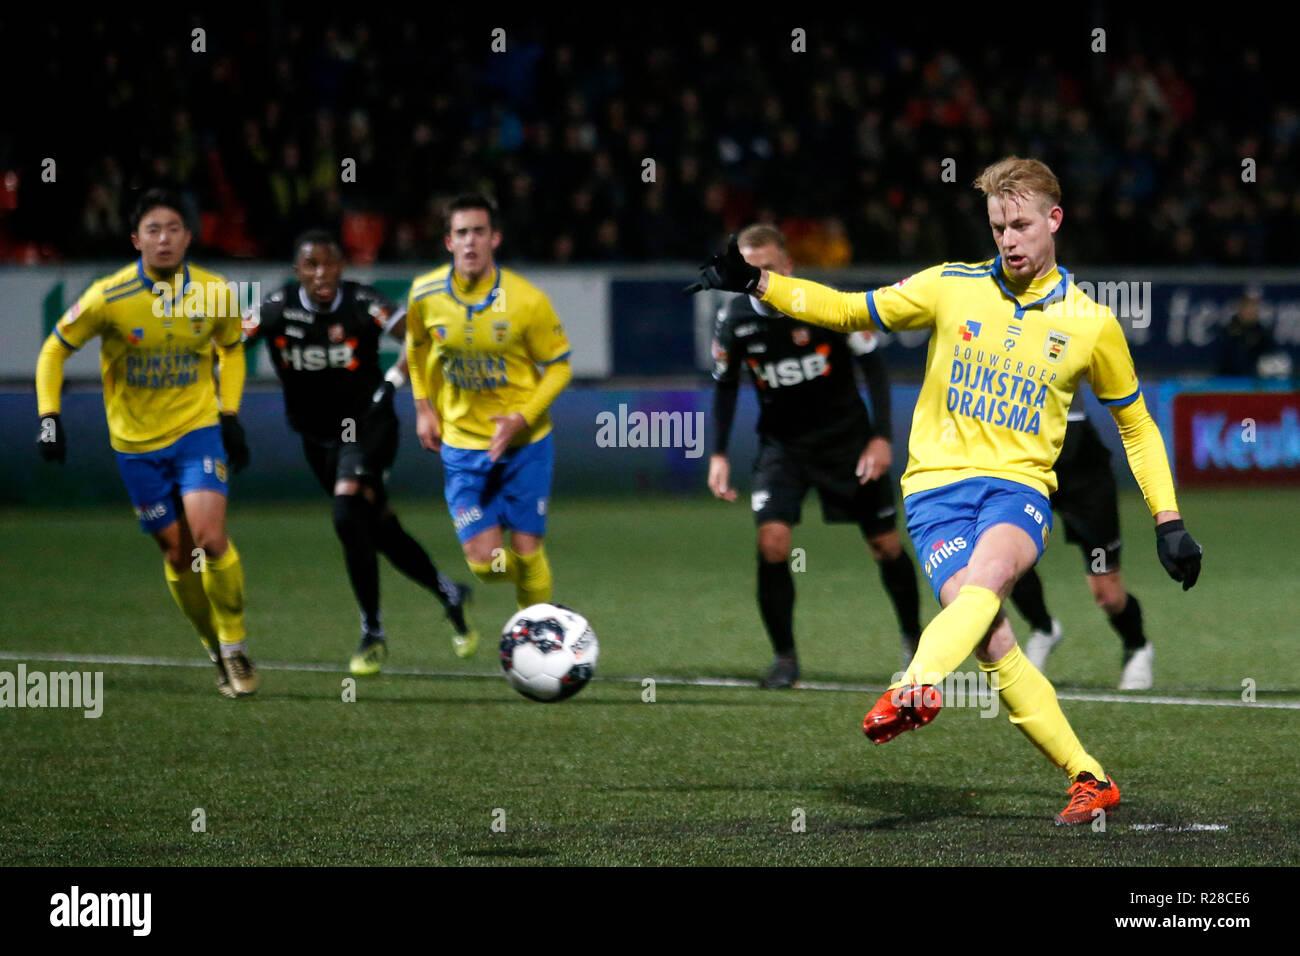 Keuken Kampioen Leeuwarden : Stade de cambuur leeuwarden 17 11 2018 la saison 2018 2019